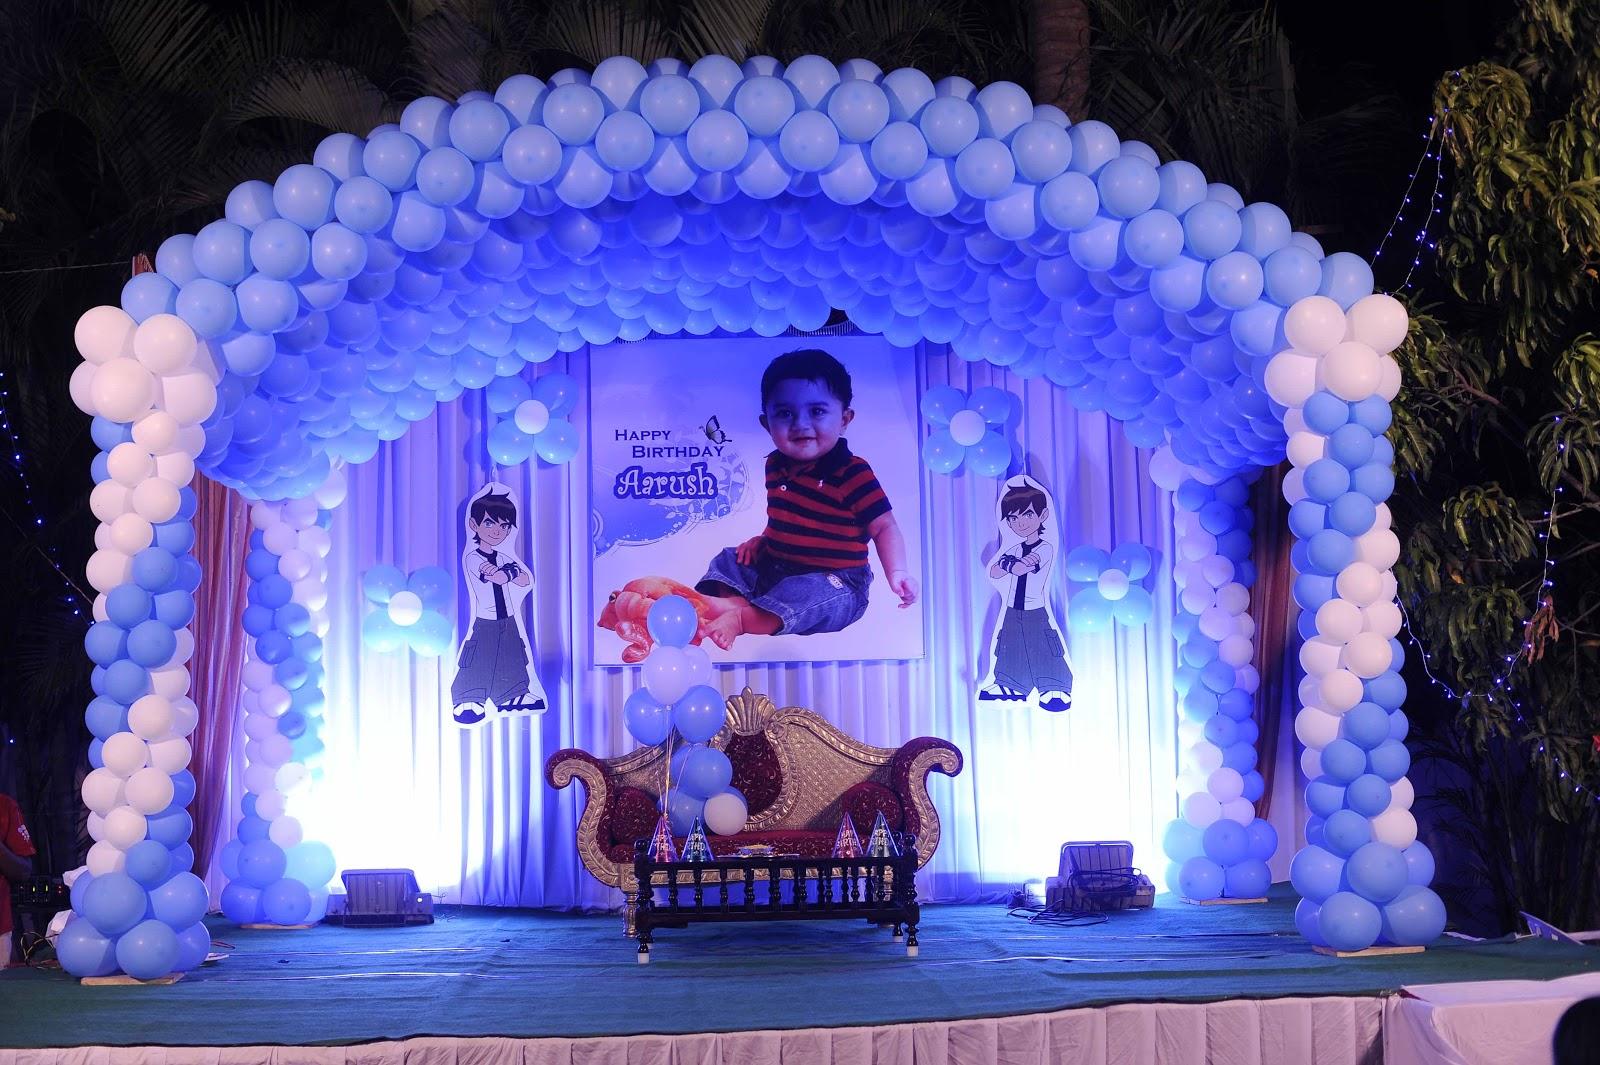 RK Balloon Decorations